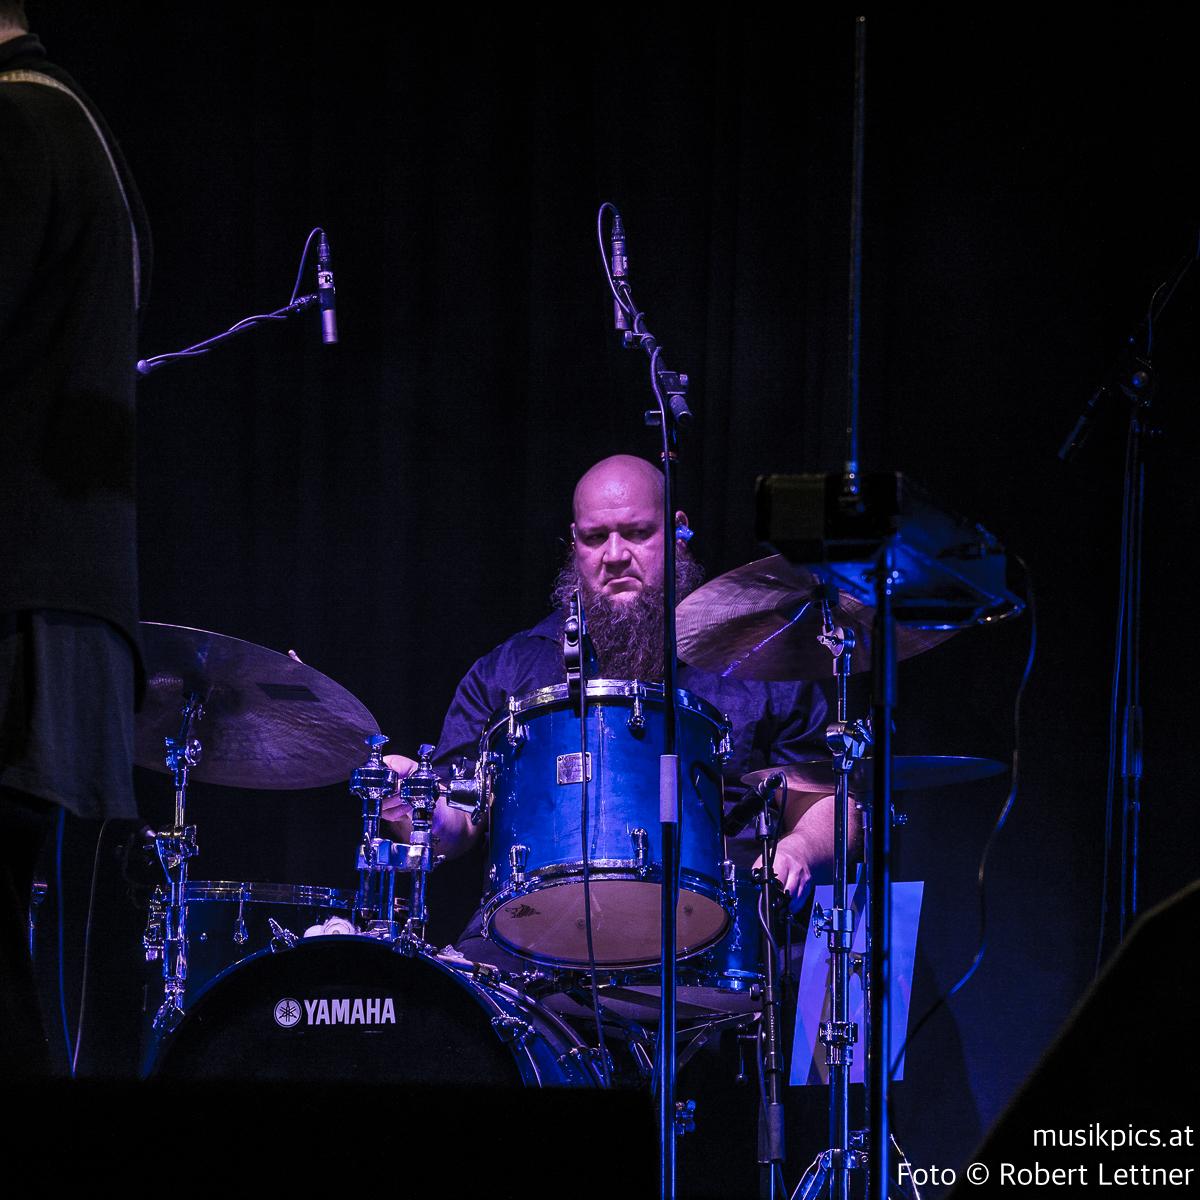 Robert-Lettner-Musikpics-Live-Music-Photography-Jarmo-Saari-Republic-DSC01274